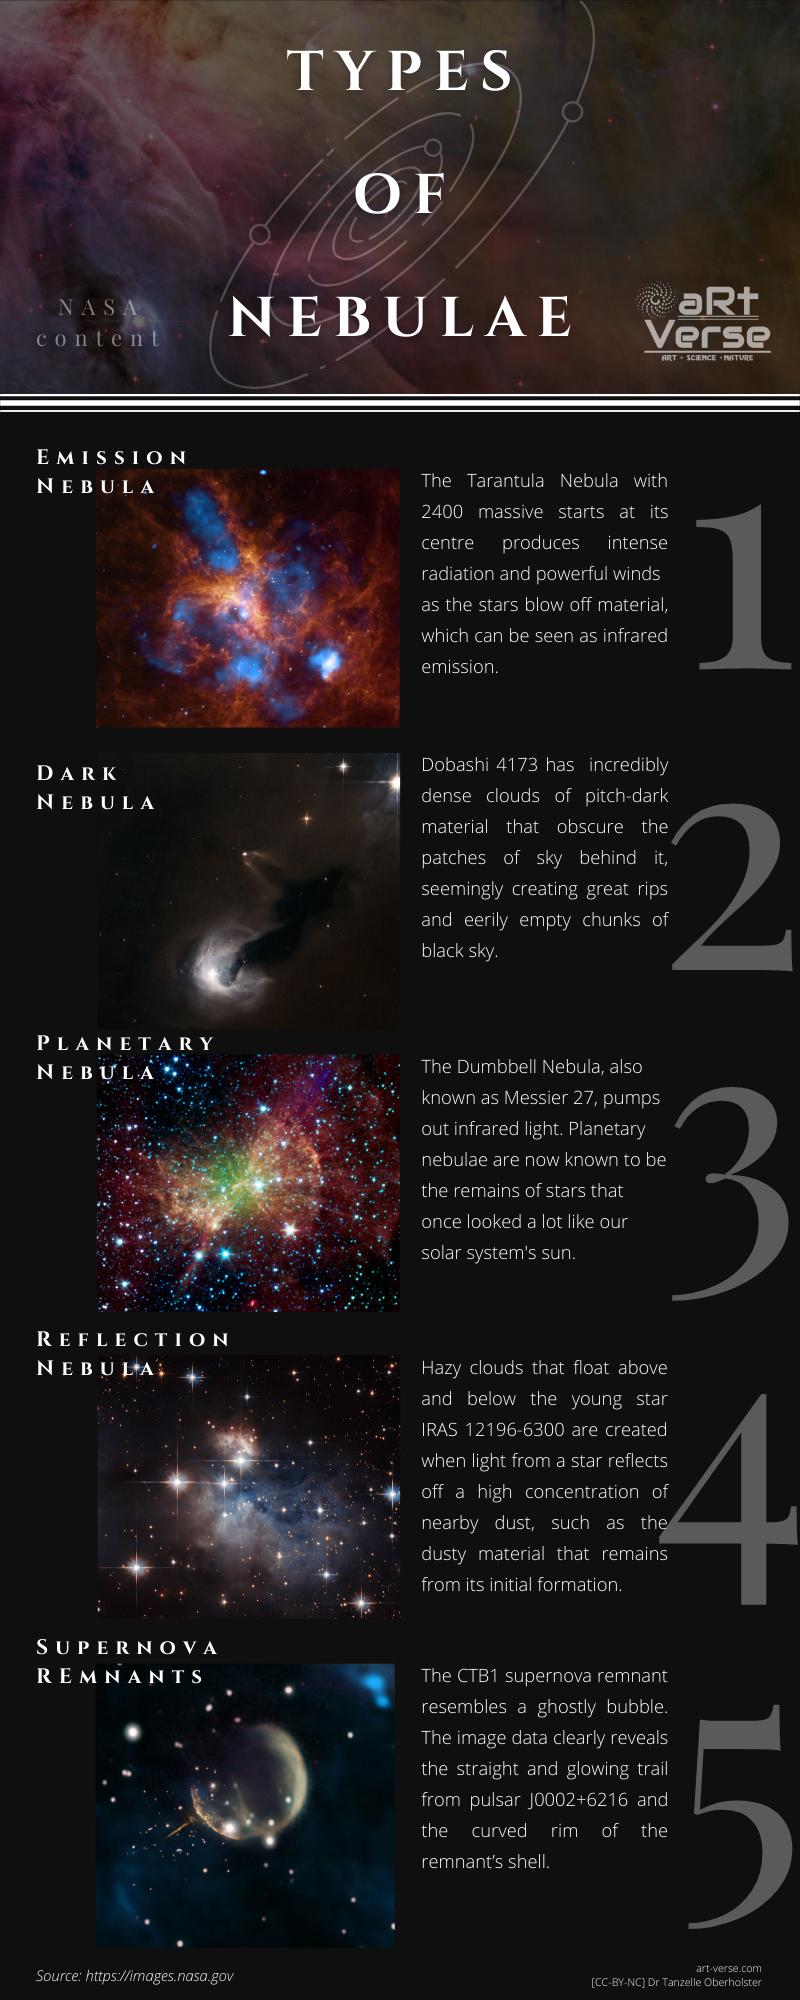 Types of nebulae, infographic, nasa, emissions, dark, planetary, reflection, supernova remnants, nebula, nebulae, space, education, artverse, Tanzelle Oberholster